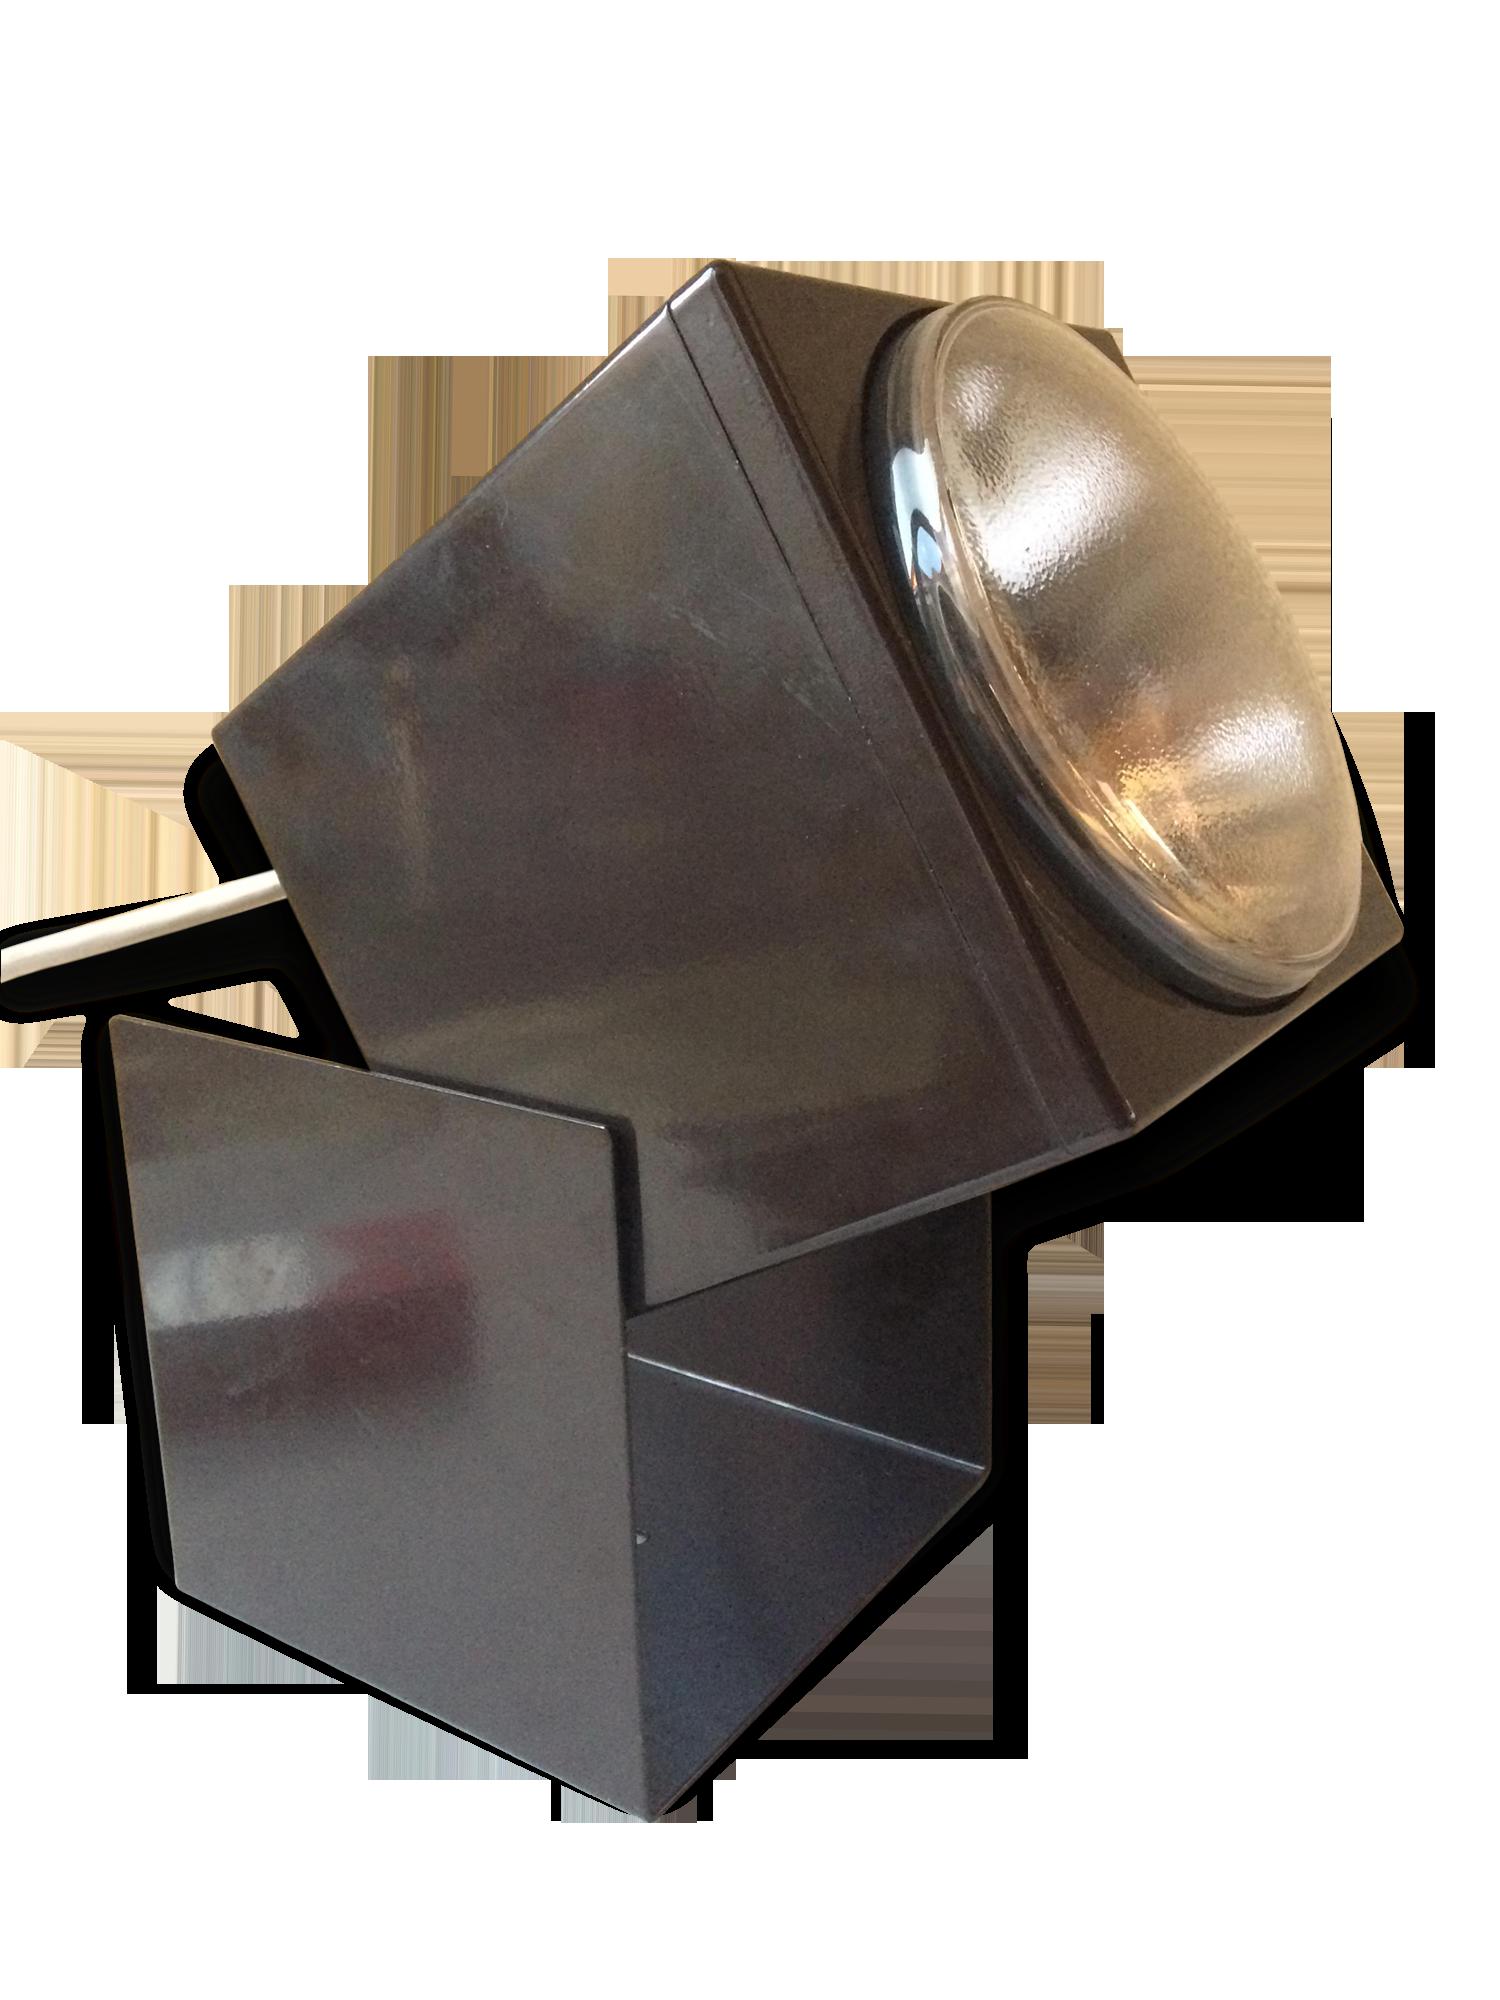 Grande applique design triangulaire plastique metal perforé